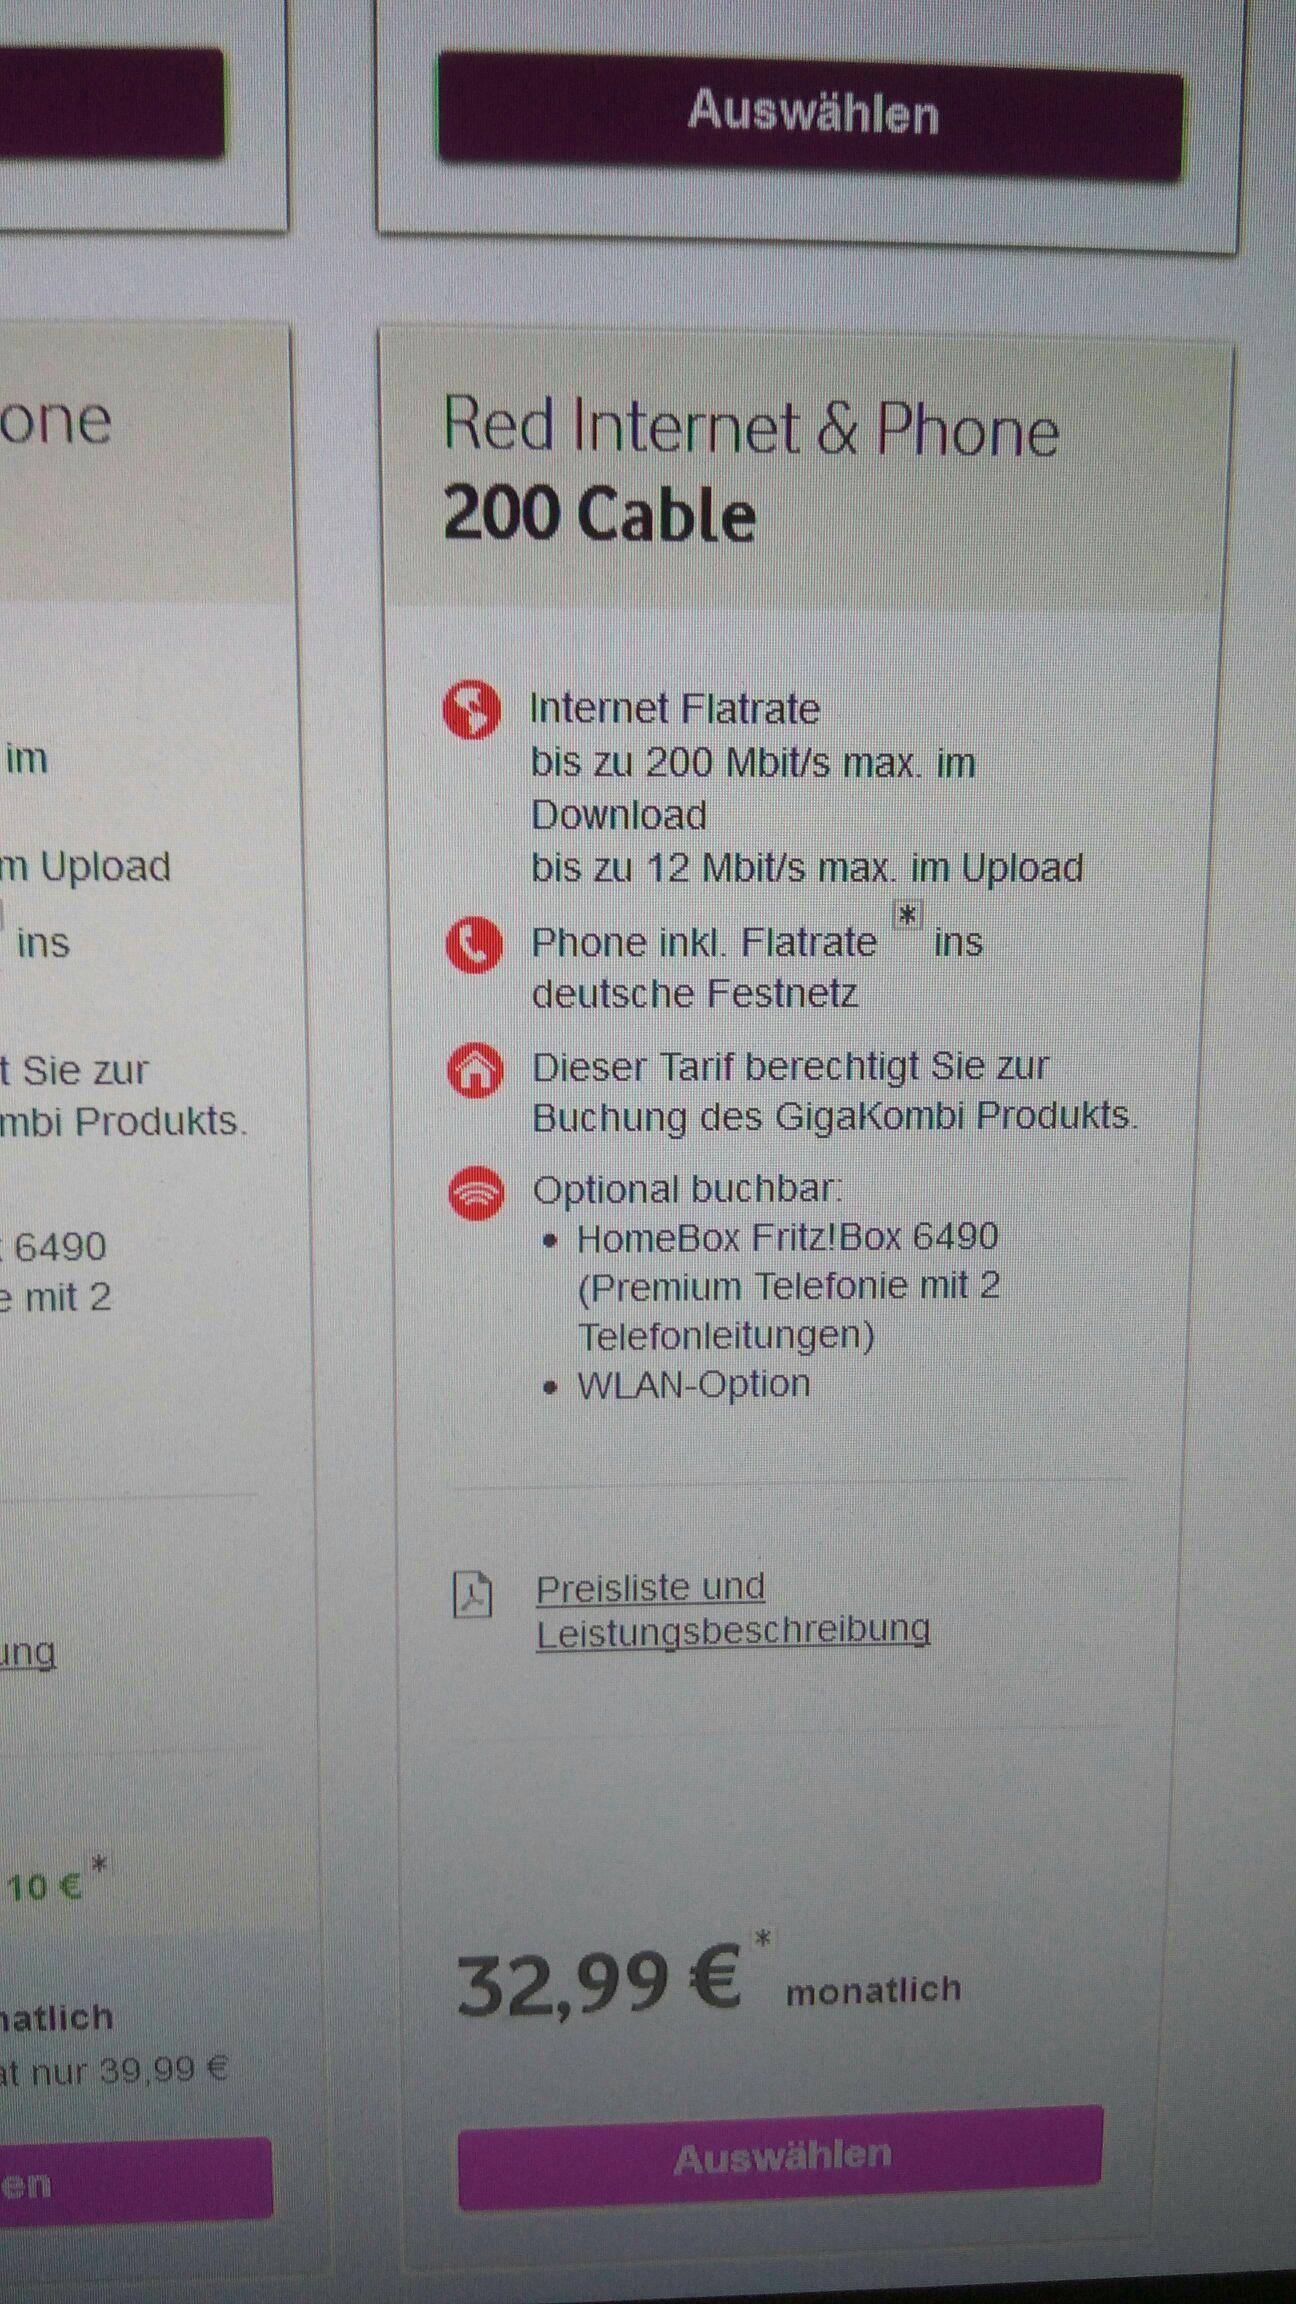 Vodafone/Kabeldeutschland Red Internet&Phone 200mbit/s *Bestandskunden*